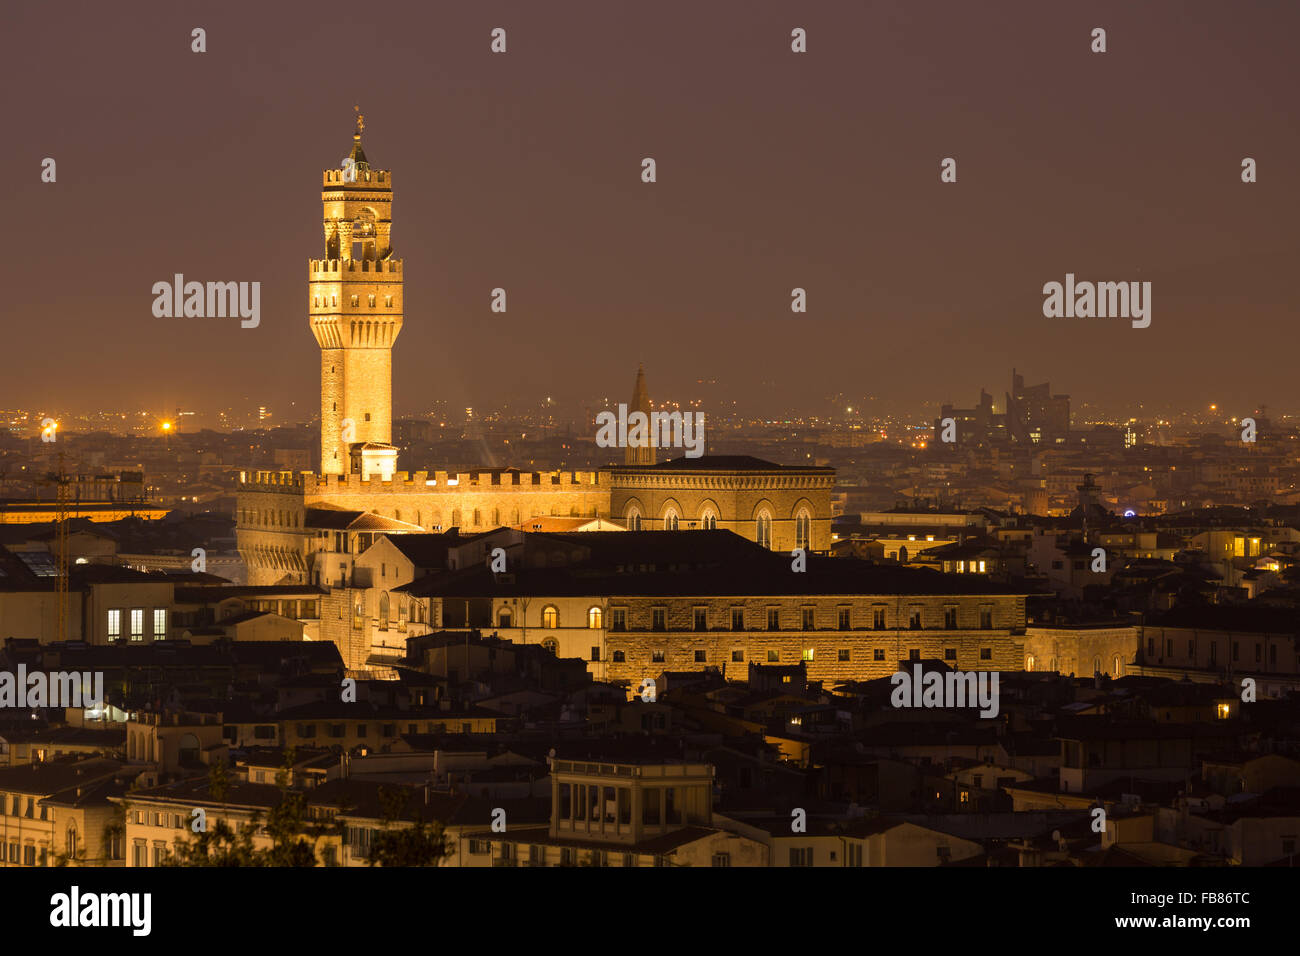 Palazzo Vecchio at night, Florence, Tuscany, Italy - Stock Image